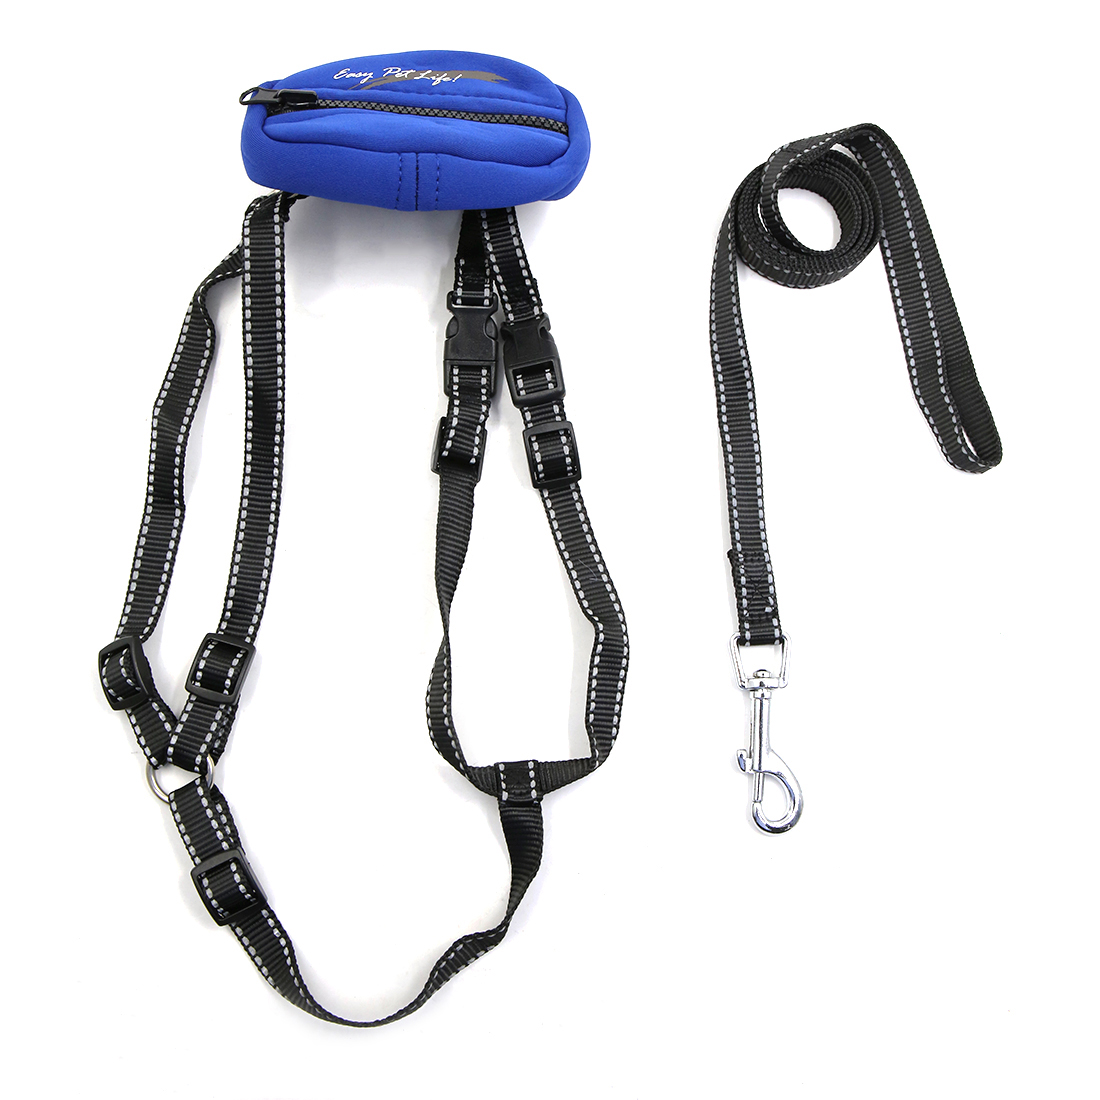 Safe Reflective Dog Harness Leash Adjustable Nylon Collar For Walking with Storage Bag Blue L